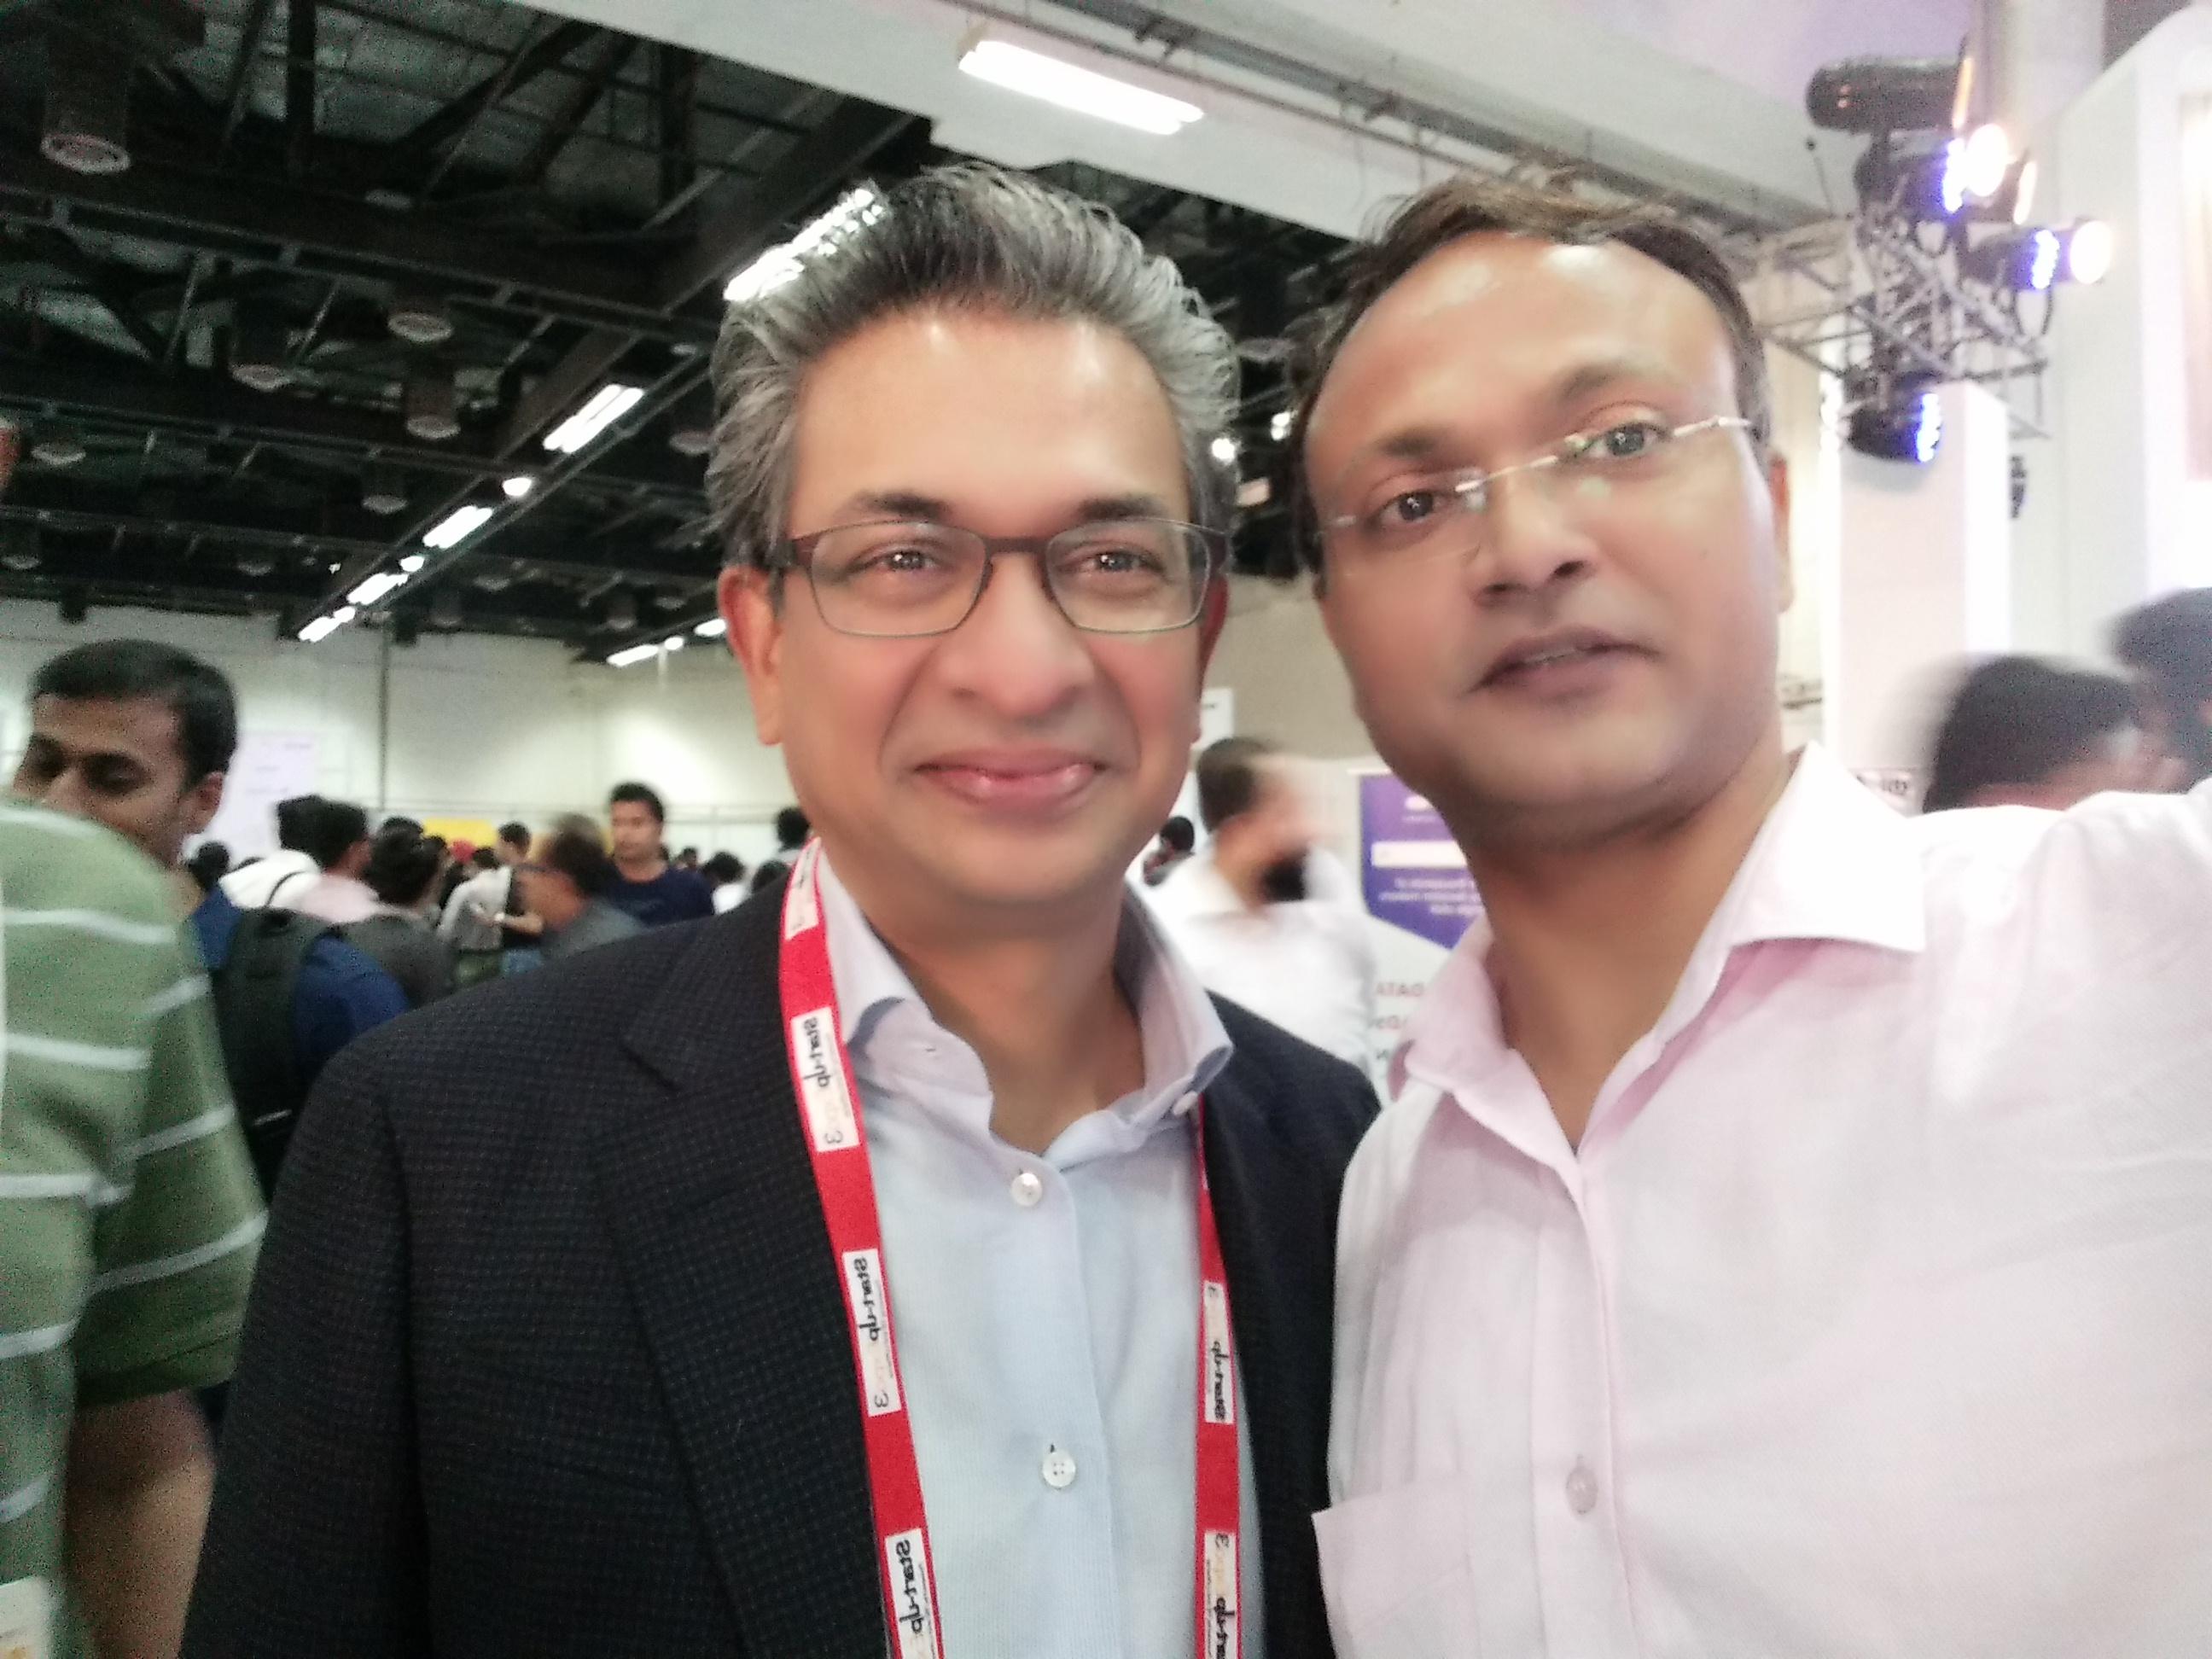 Sanjeev Kumar Atoall.com with Rajan Anandan Google.com for next Billion INTERNET Users